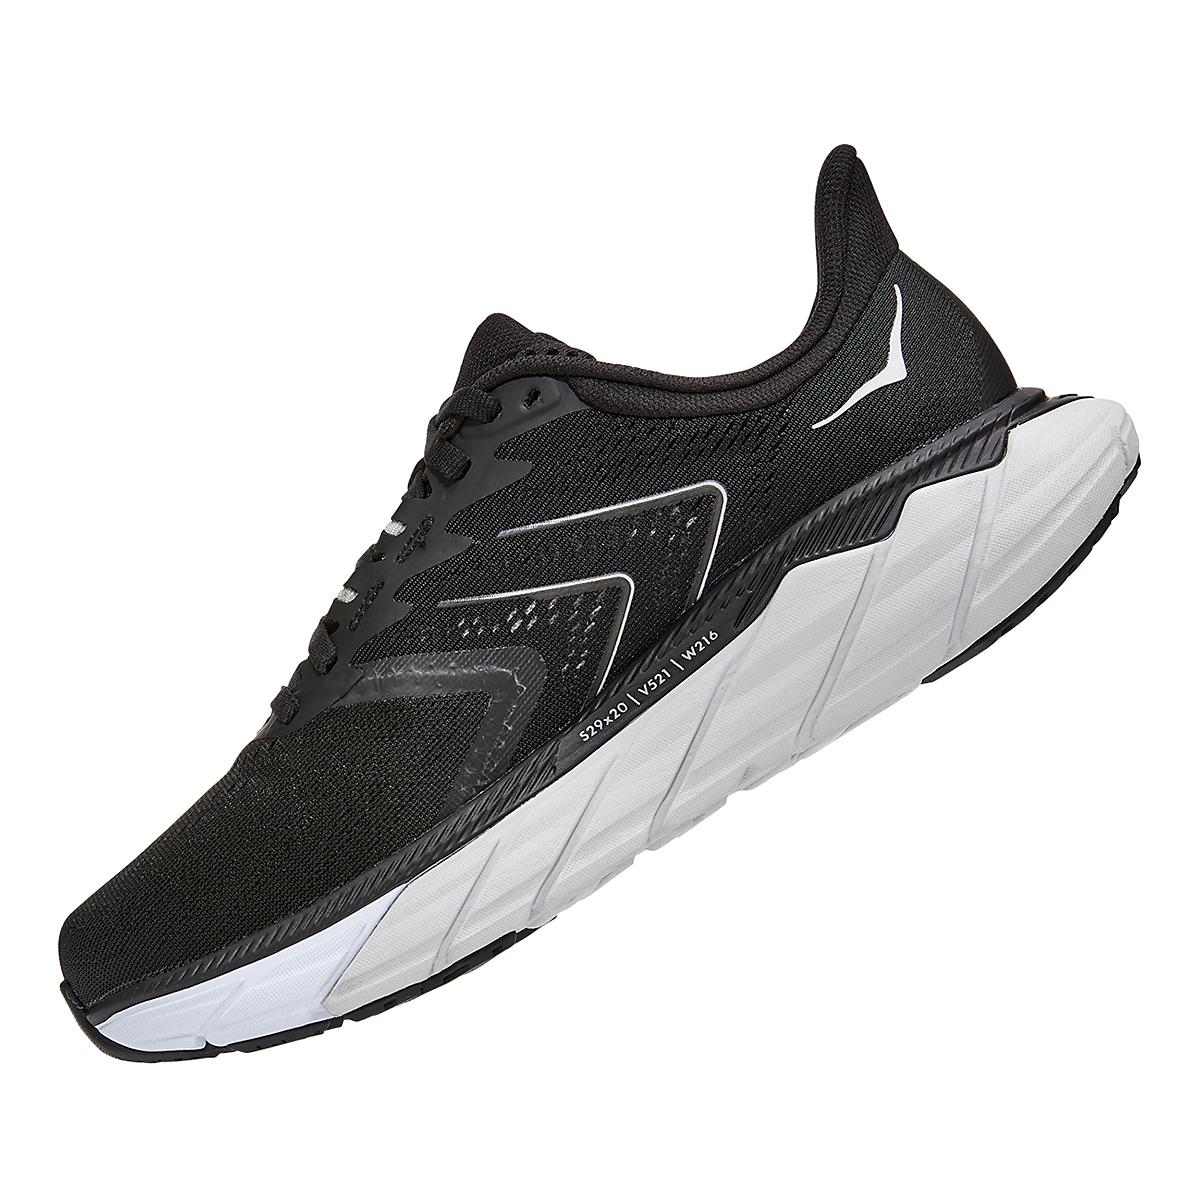 Women's Hoka One One Arahi 5 Running Shoe - Color: Black/White - Size: 5 - Width: Regular, Black/White, large, image 4